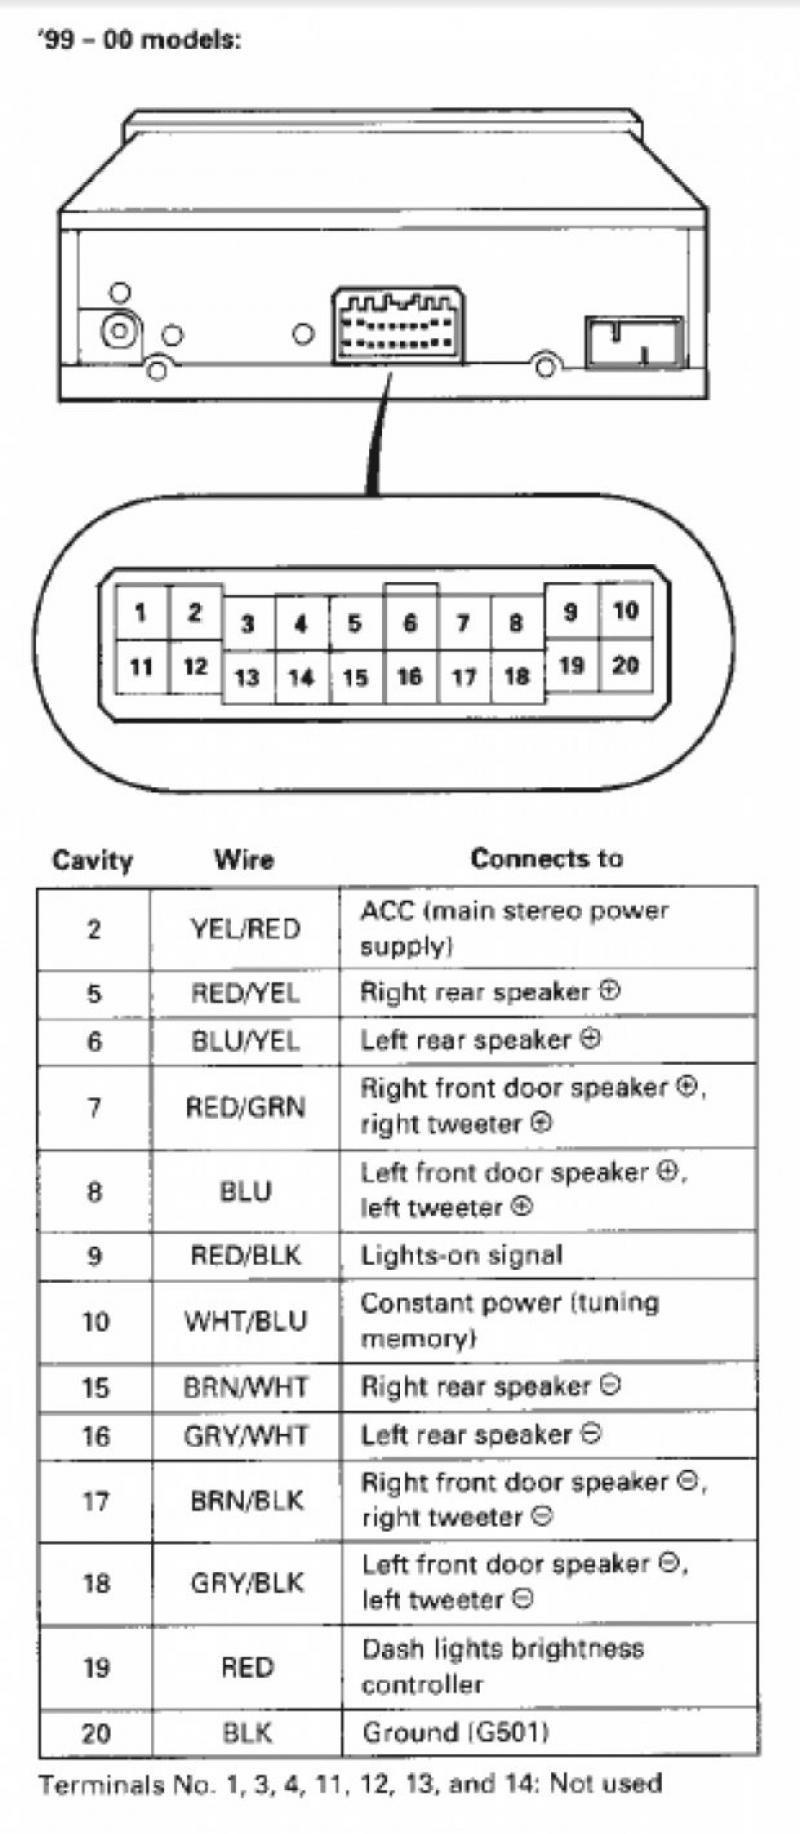 Jvc Stereo Wiring | Releaseganji - Jvc Wiring Harness Diagram